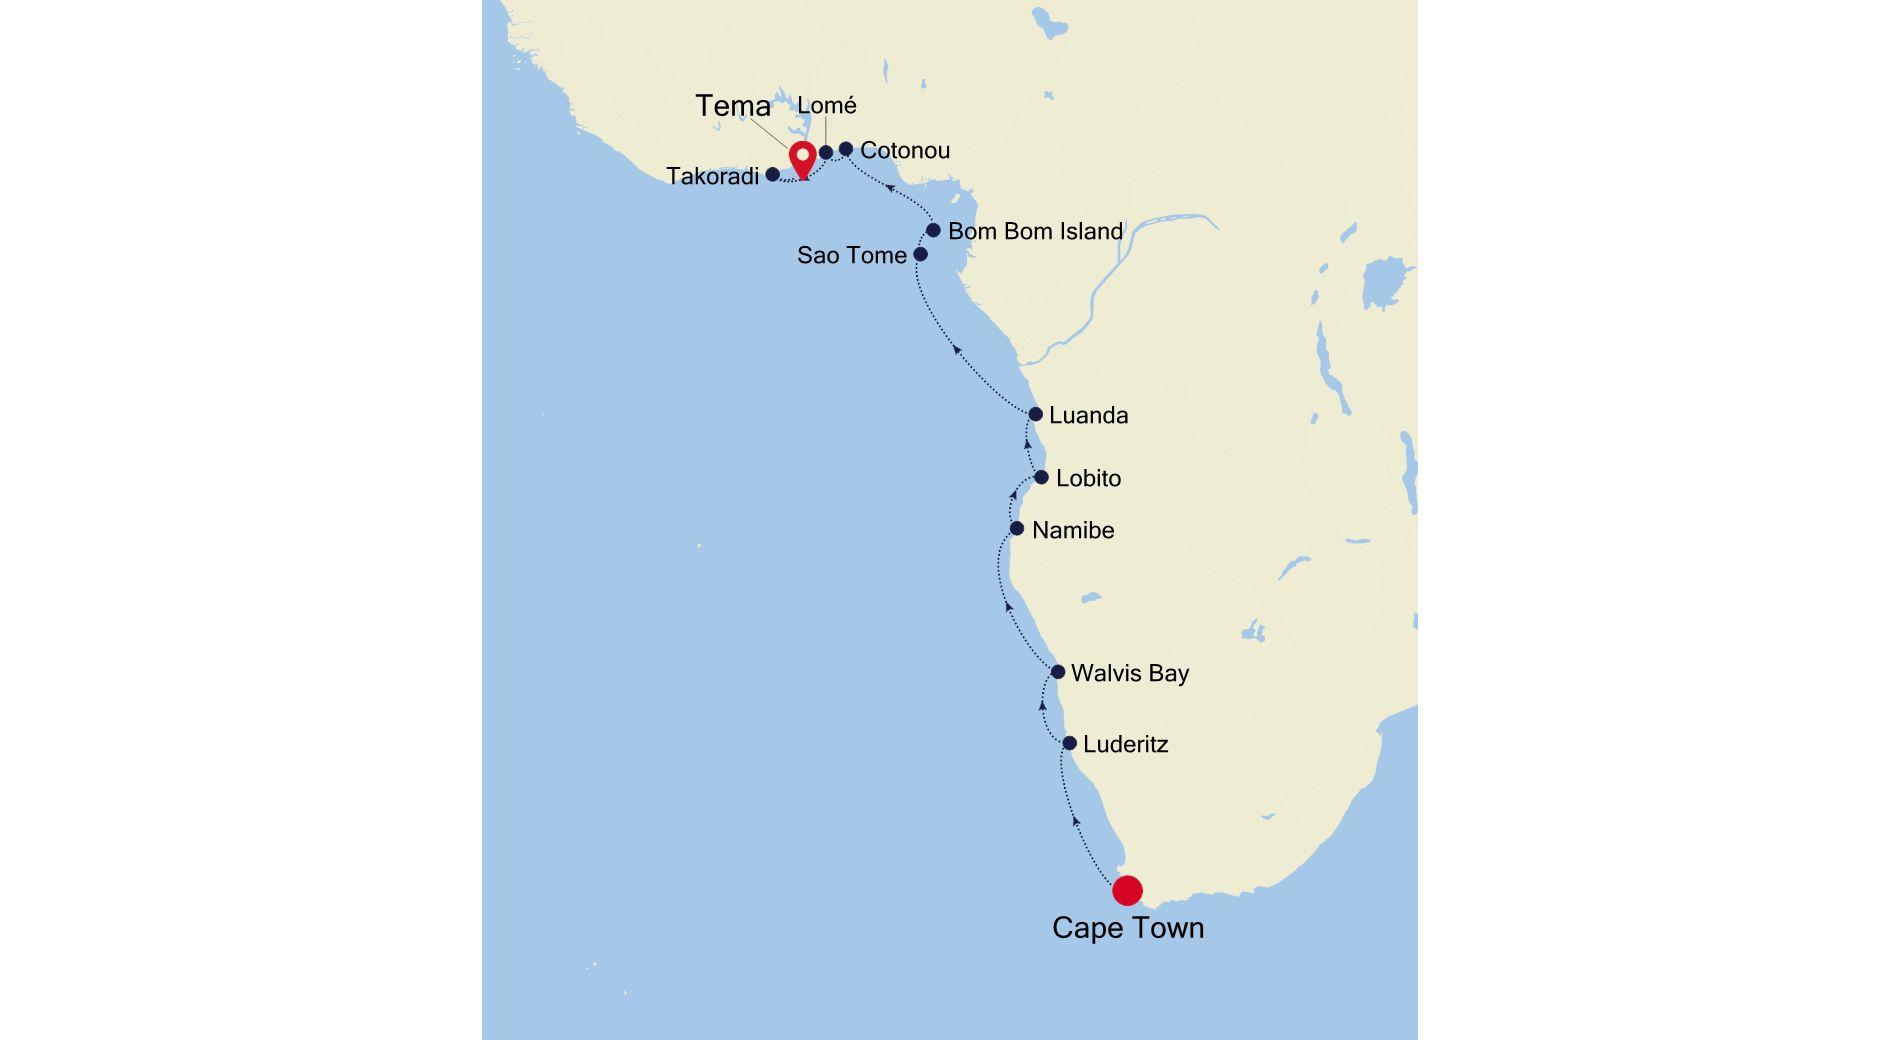 E4200320018 - Cape Town to Tema